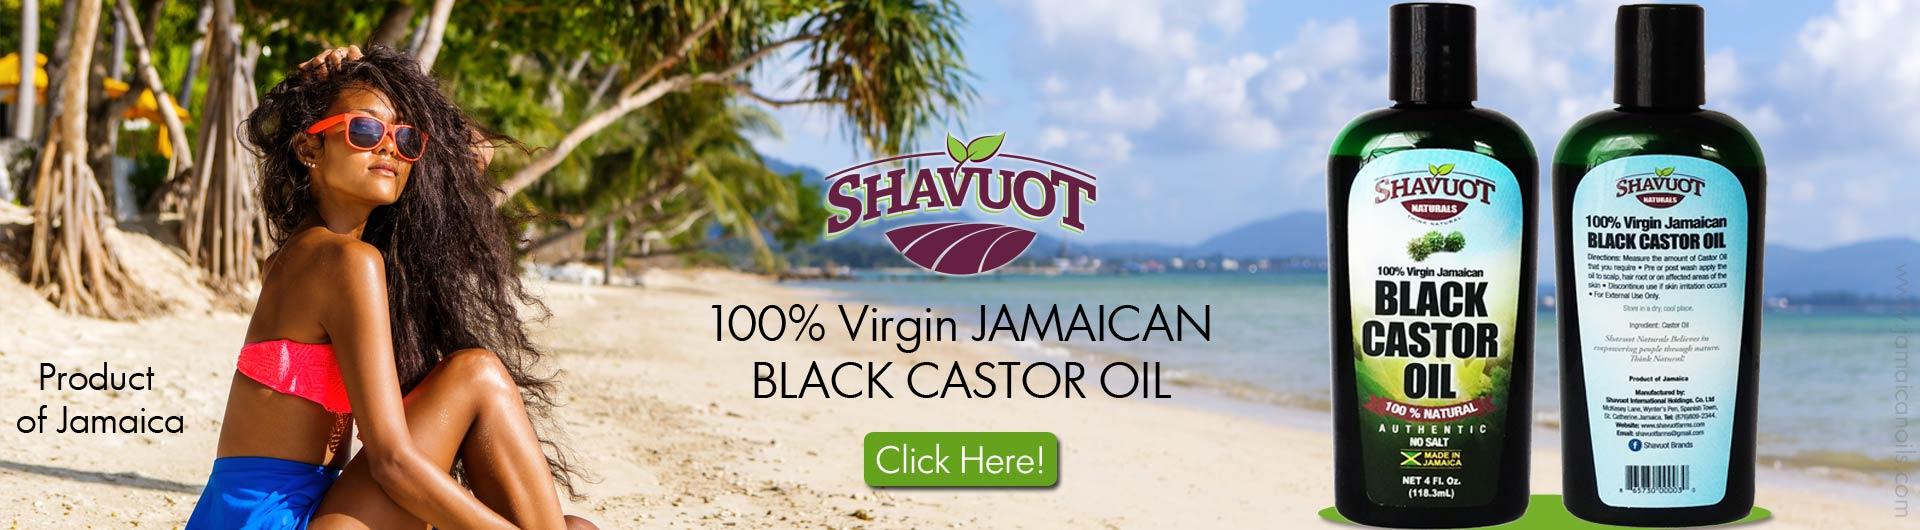 Shavuot JBCO